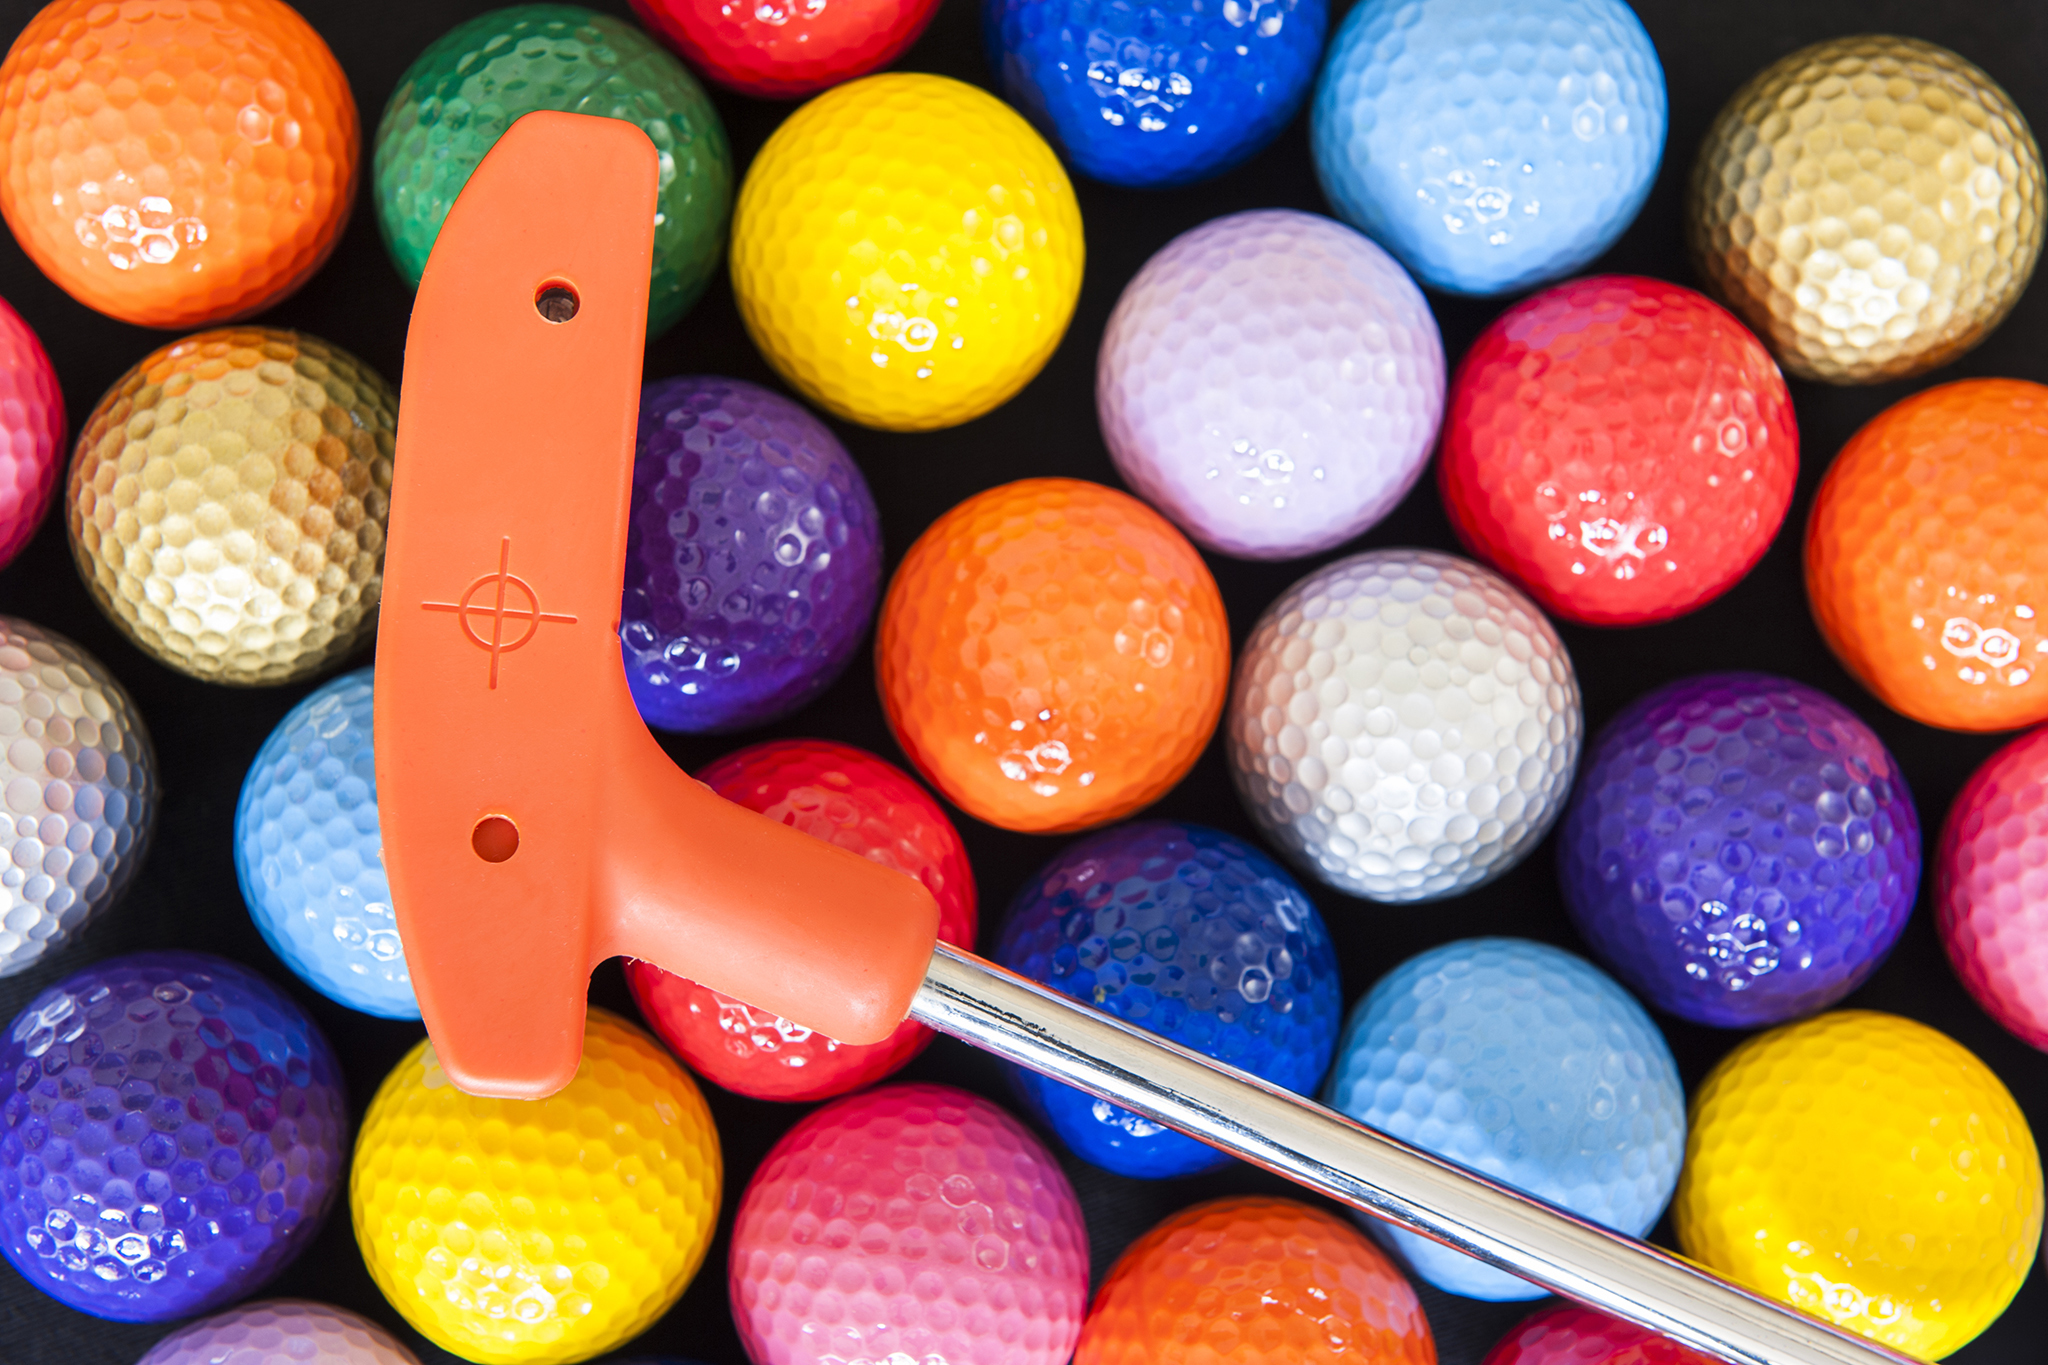 Shipwrecked Miniature Golf